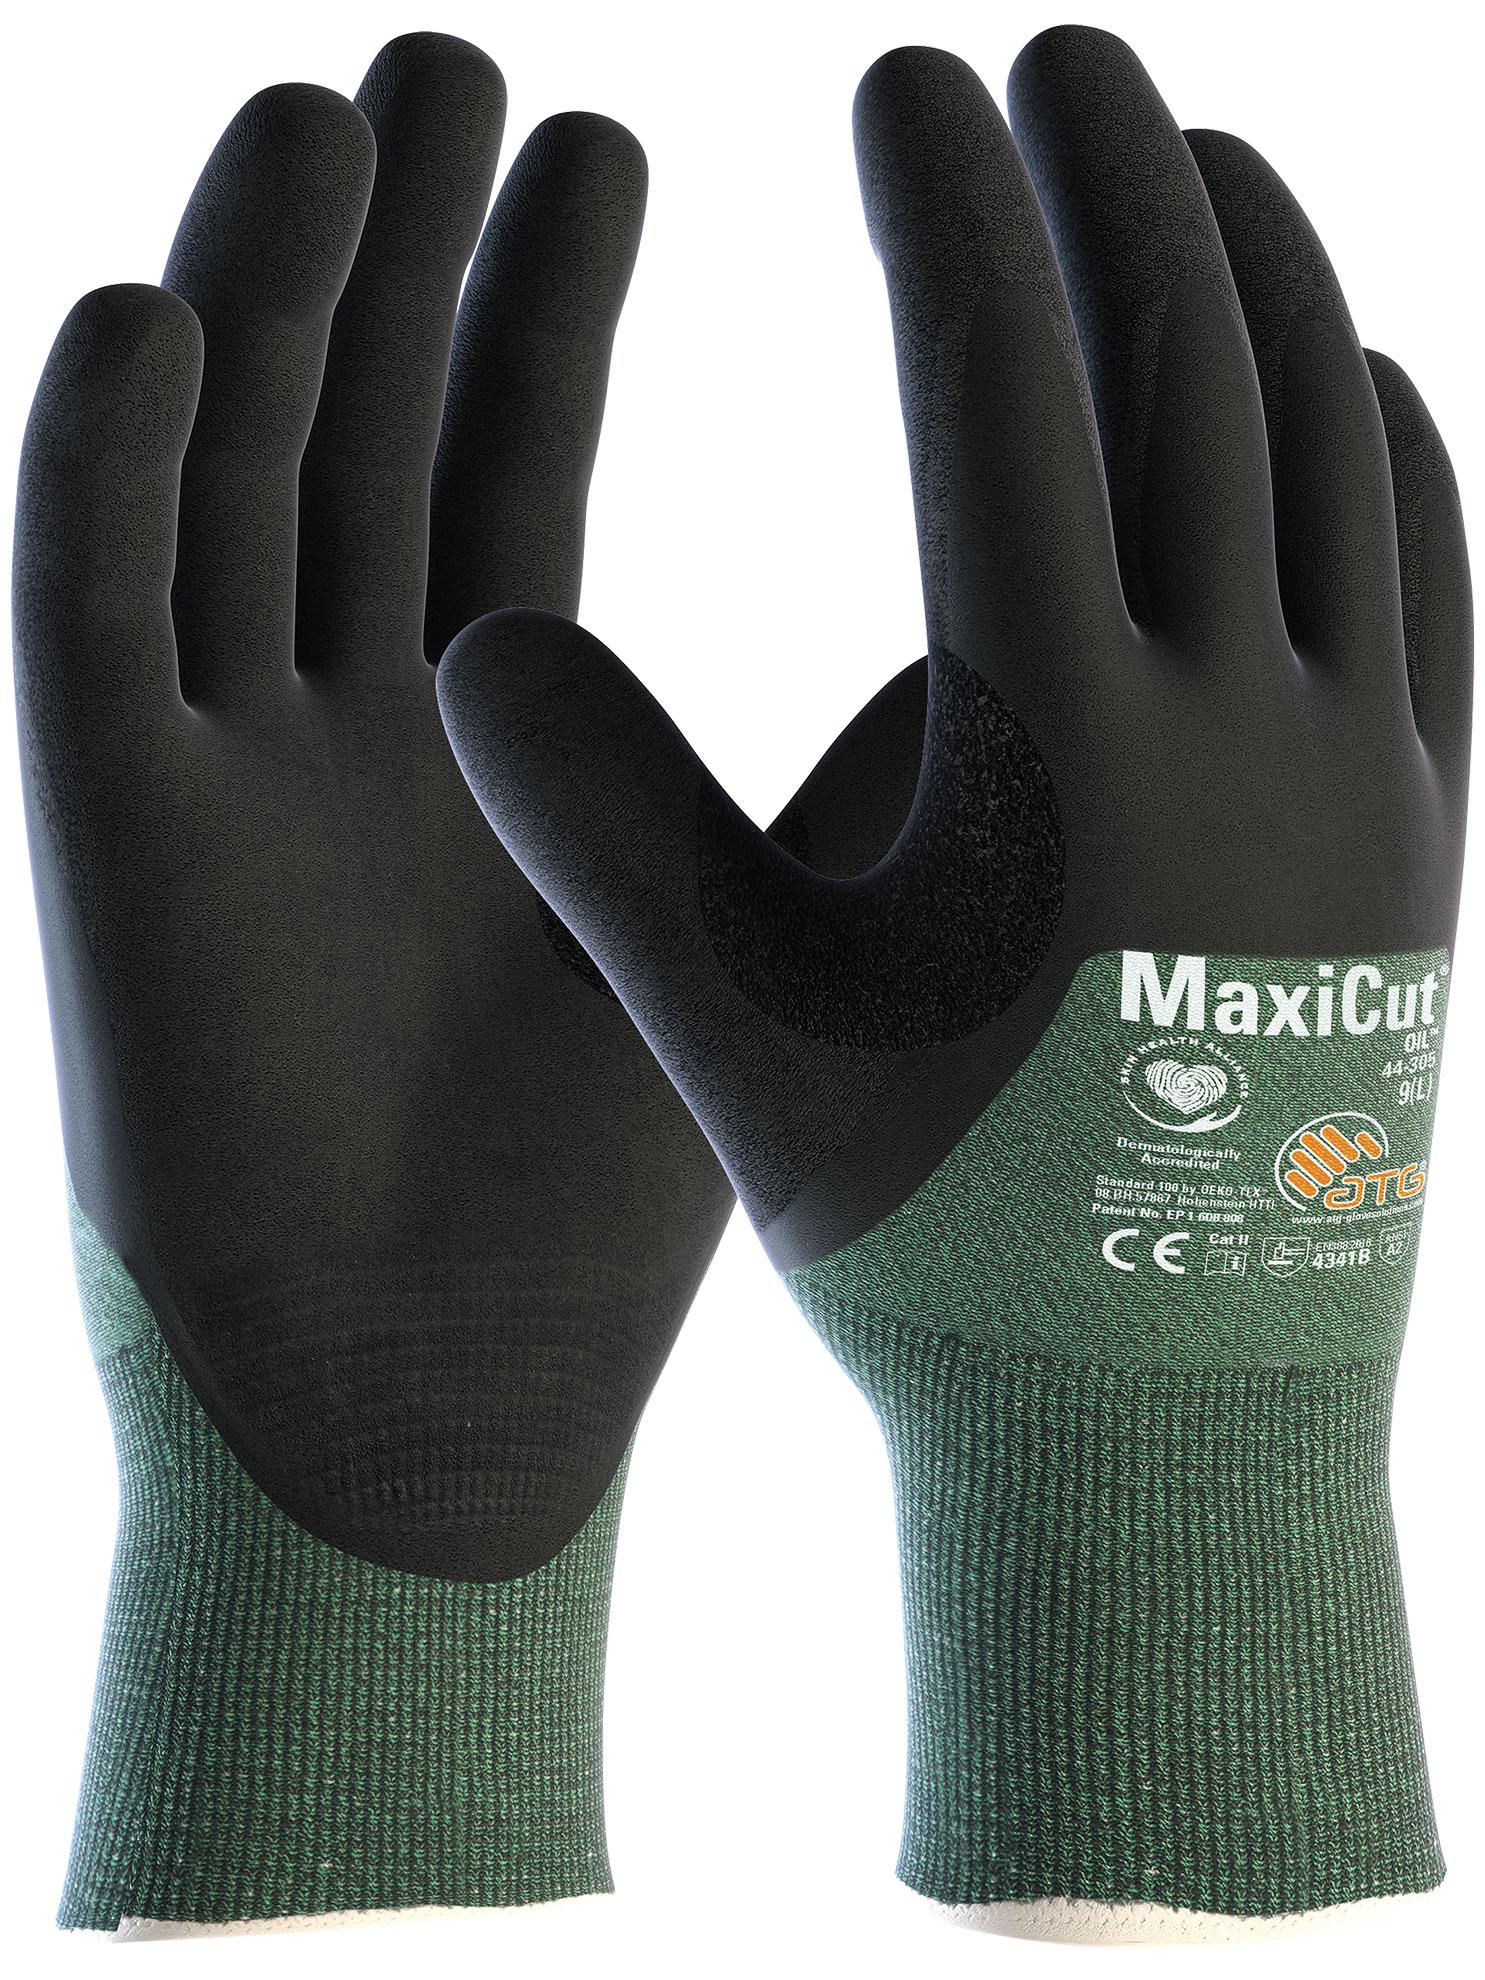 44-305 MaxiCut® Oil